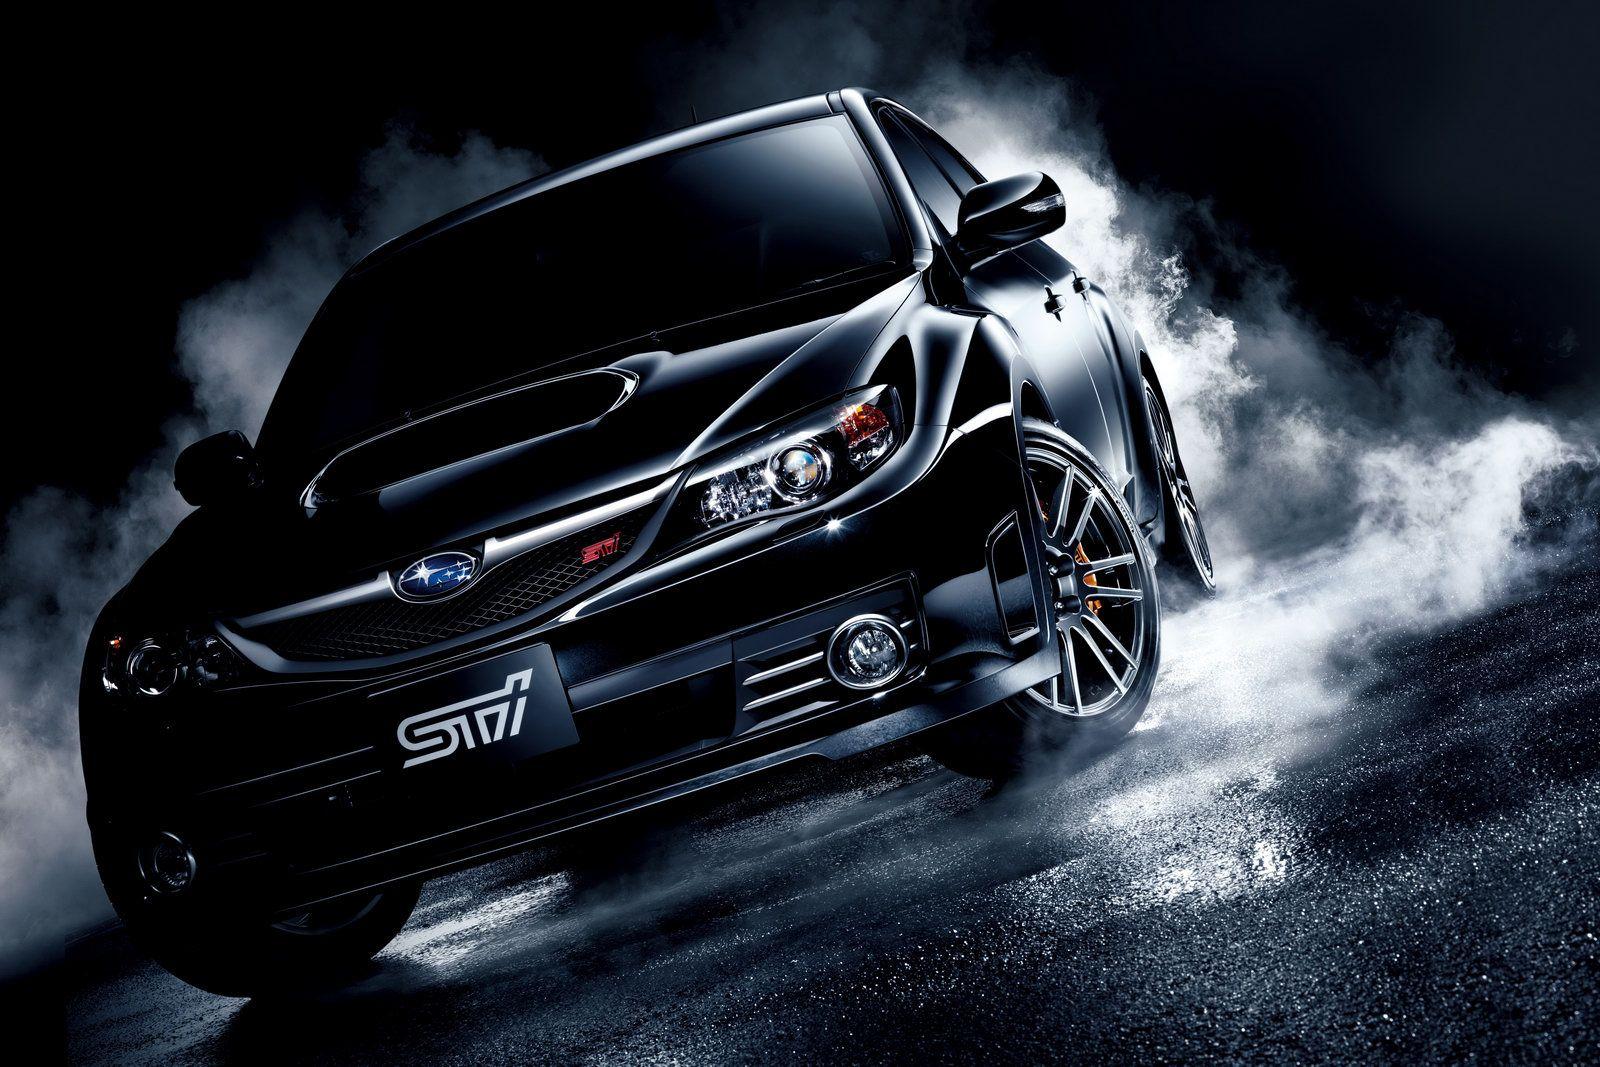 Black Glamorous Car With Smoke In Dark Night Hd Wallpaper Night